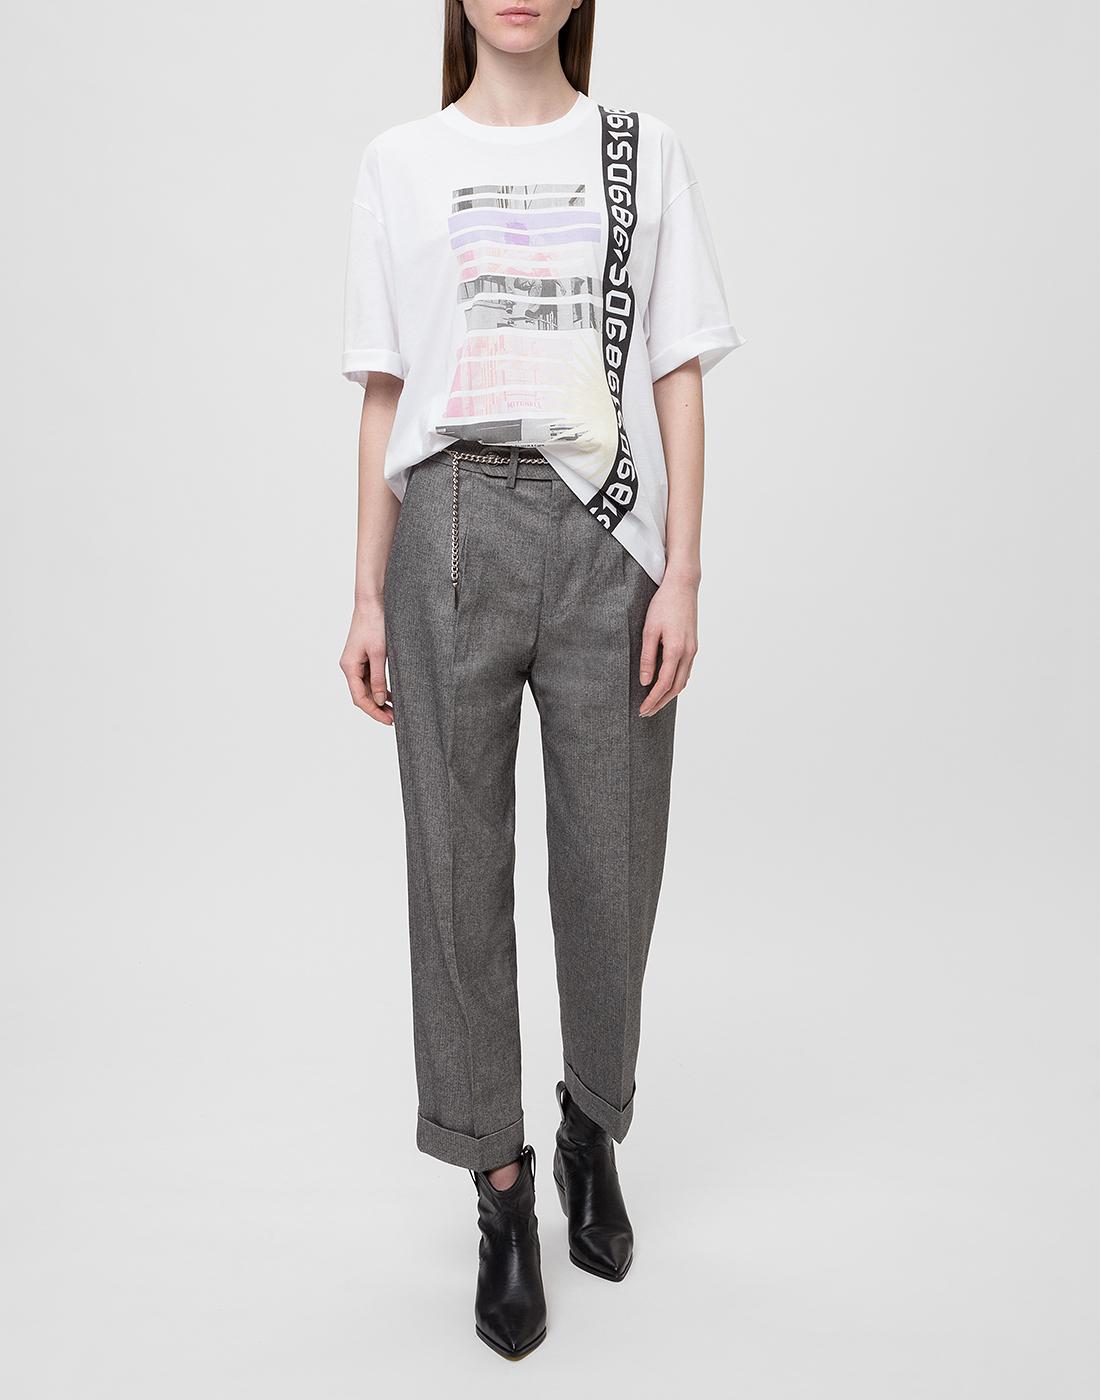 Женские серые брюки Tramarossa SO168-5